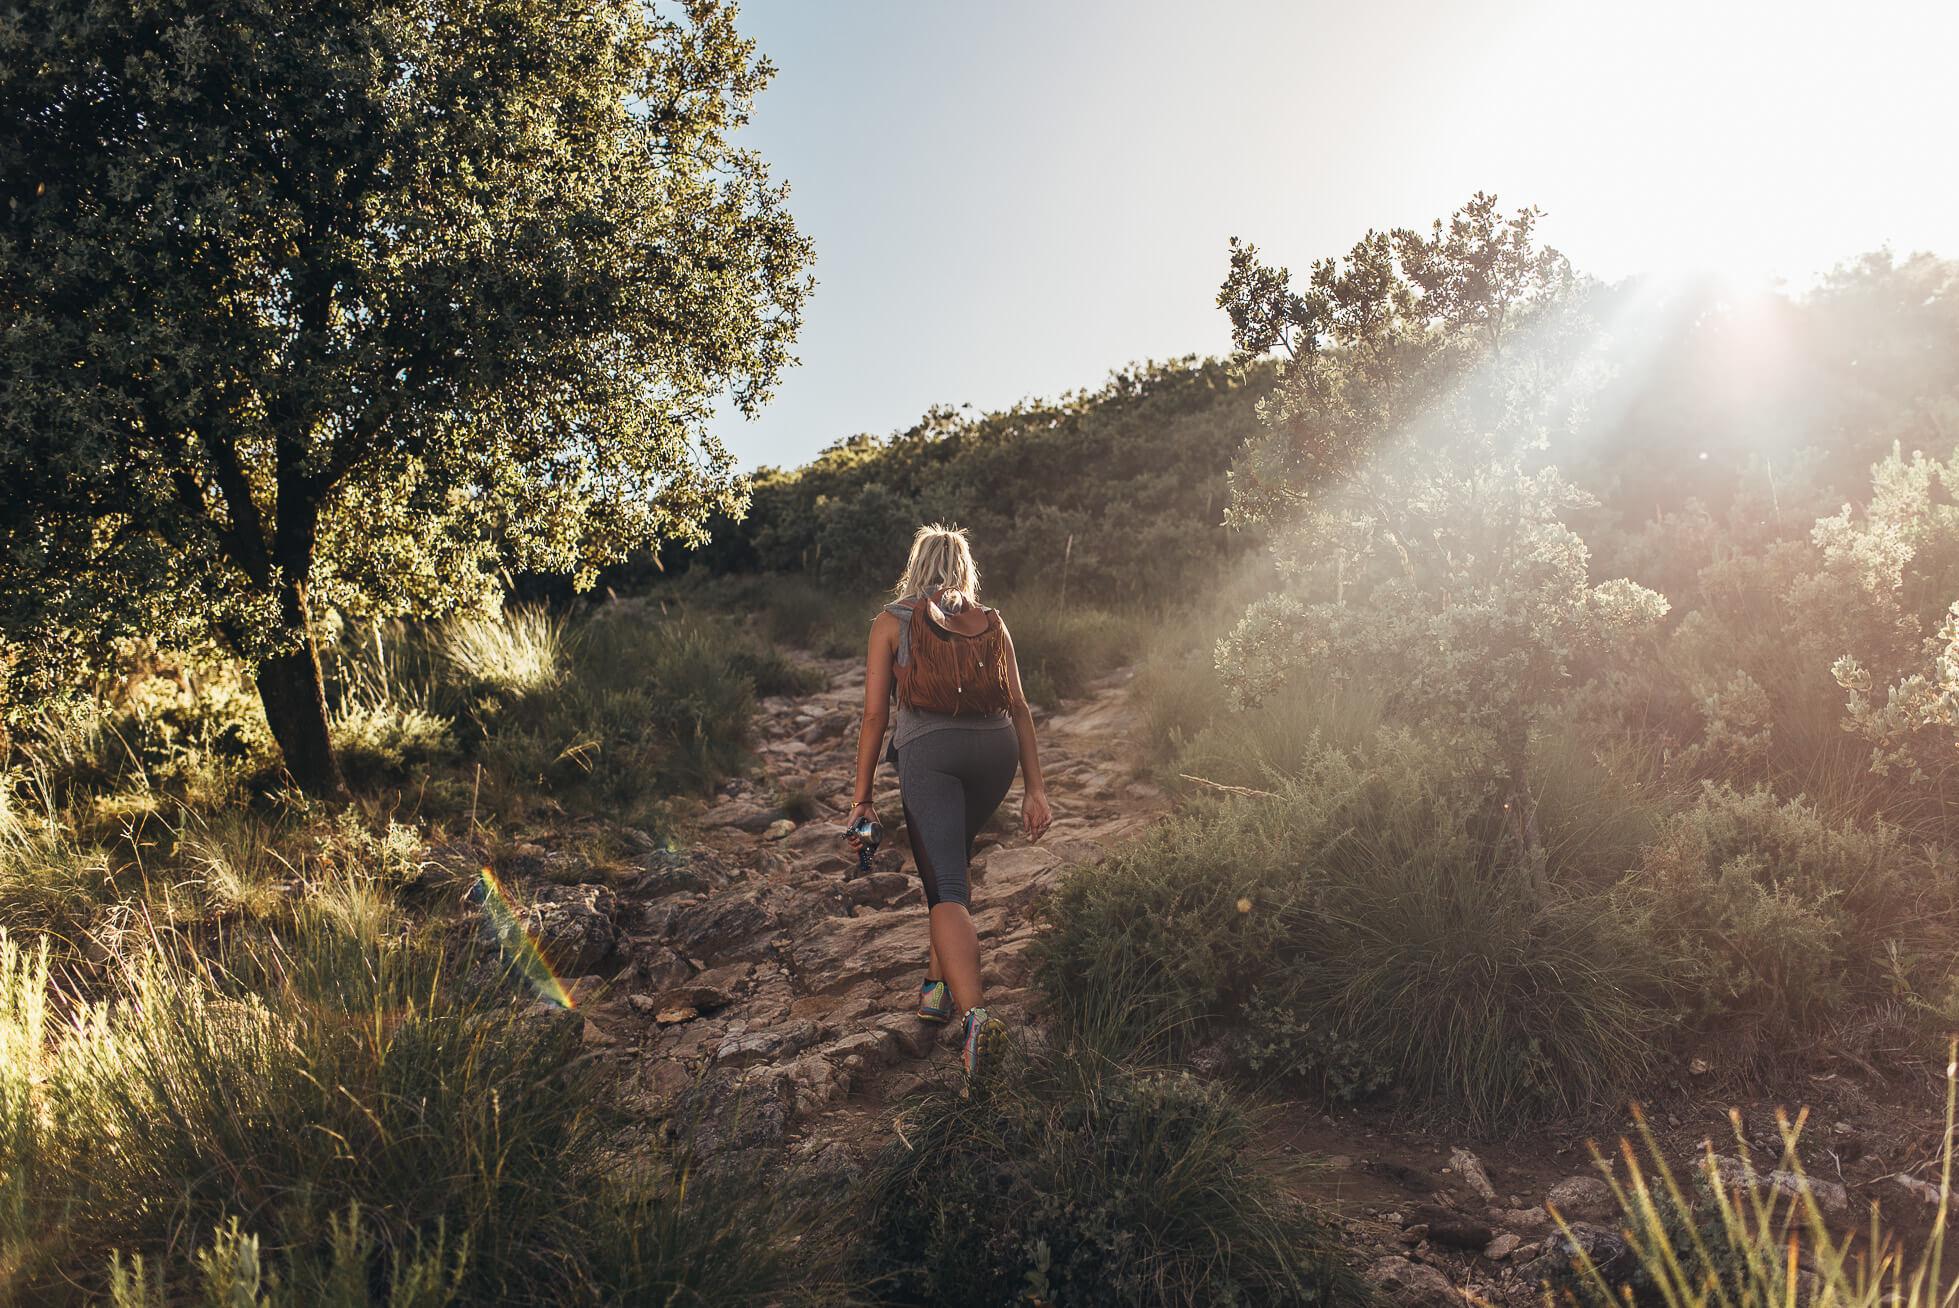 janni-deler-adventures-la-conchaDSC_8256